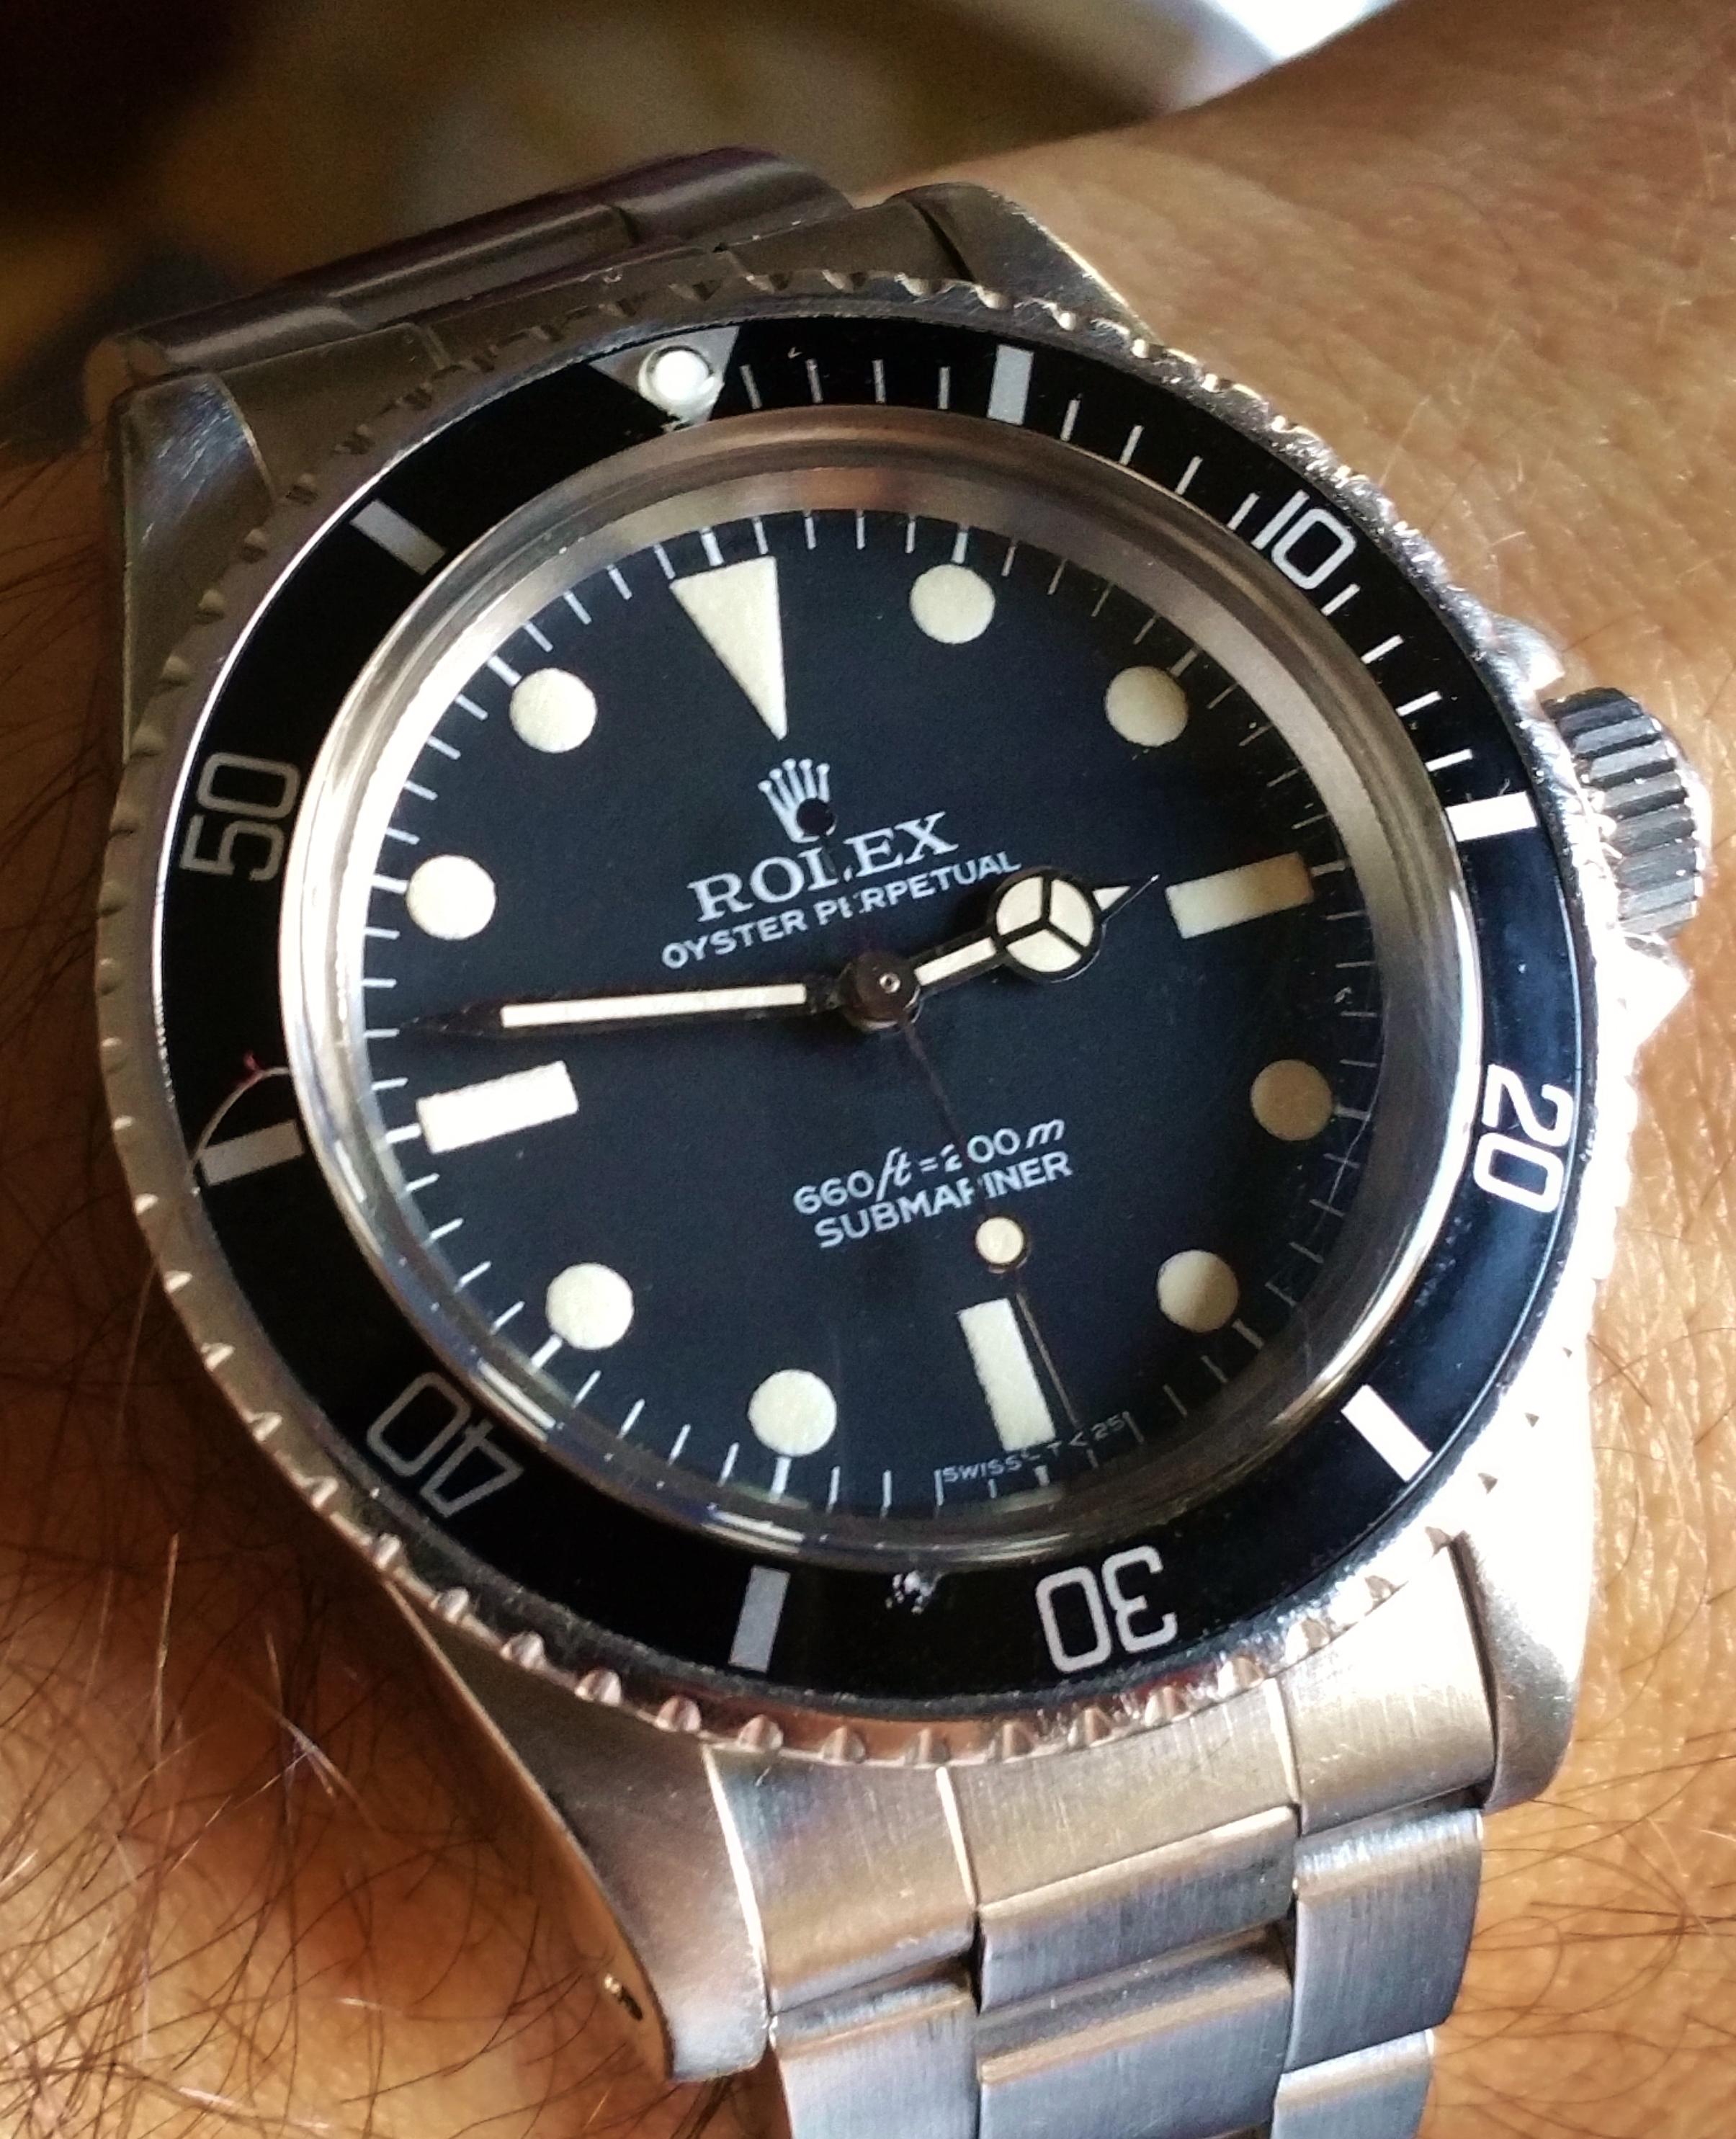 1977 Rolex Submariner 5513 Pre COMEX Dial